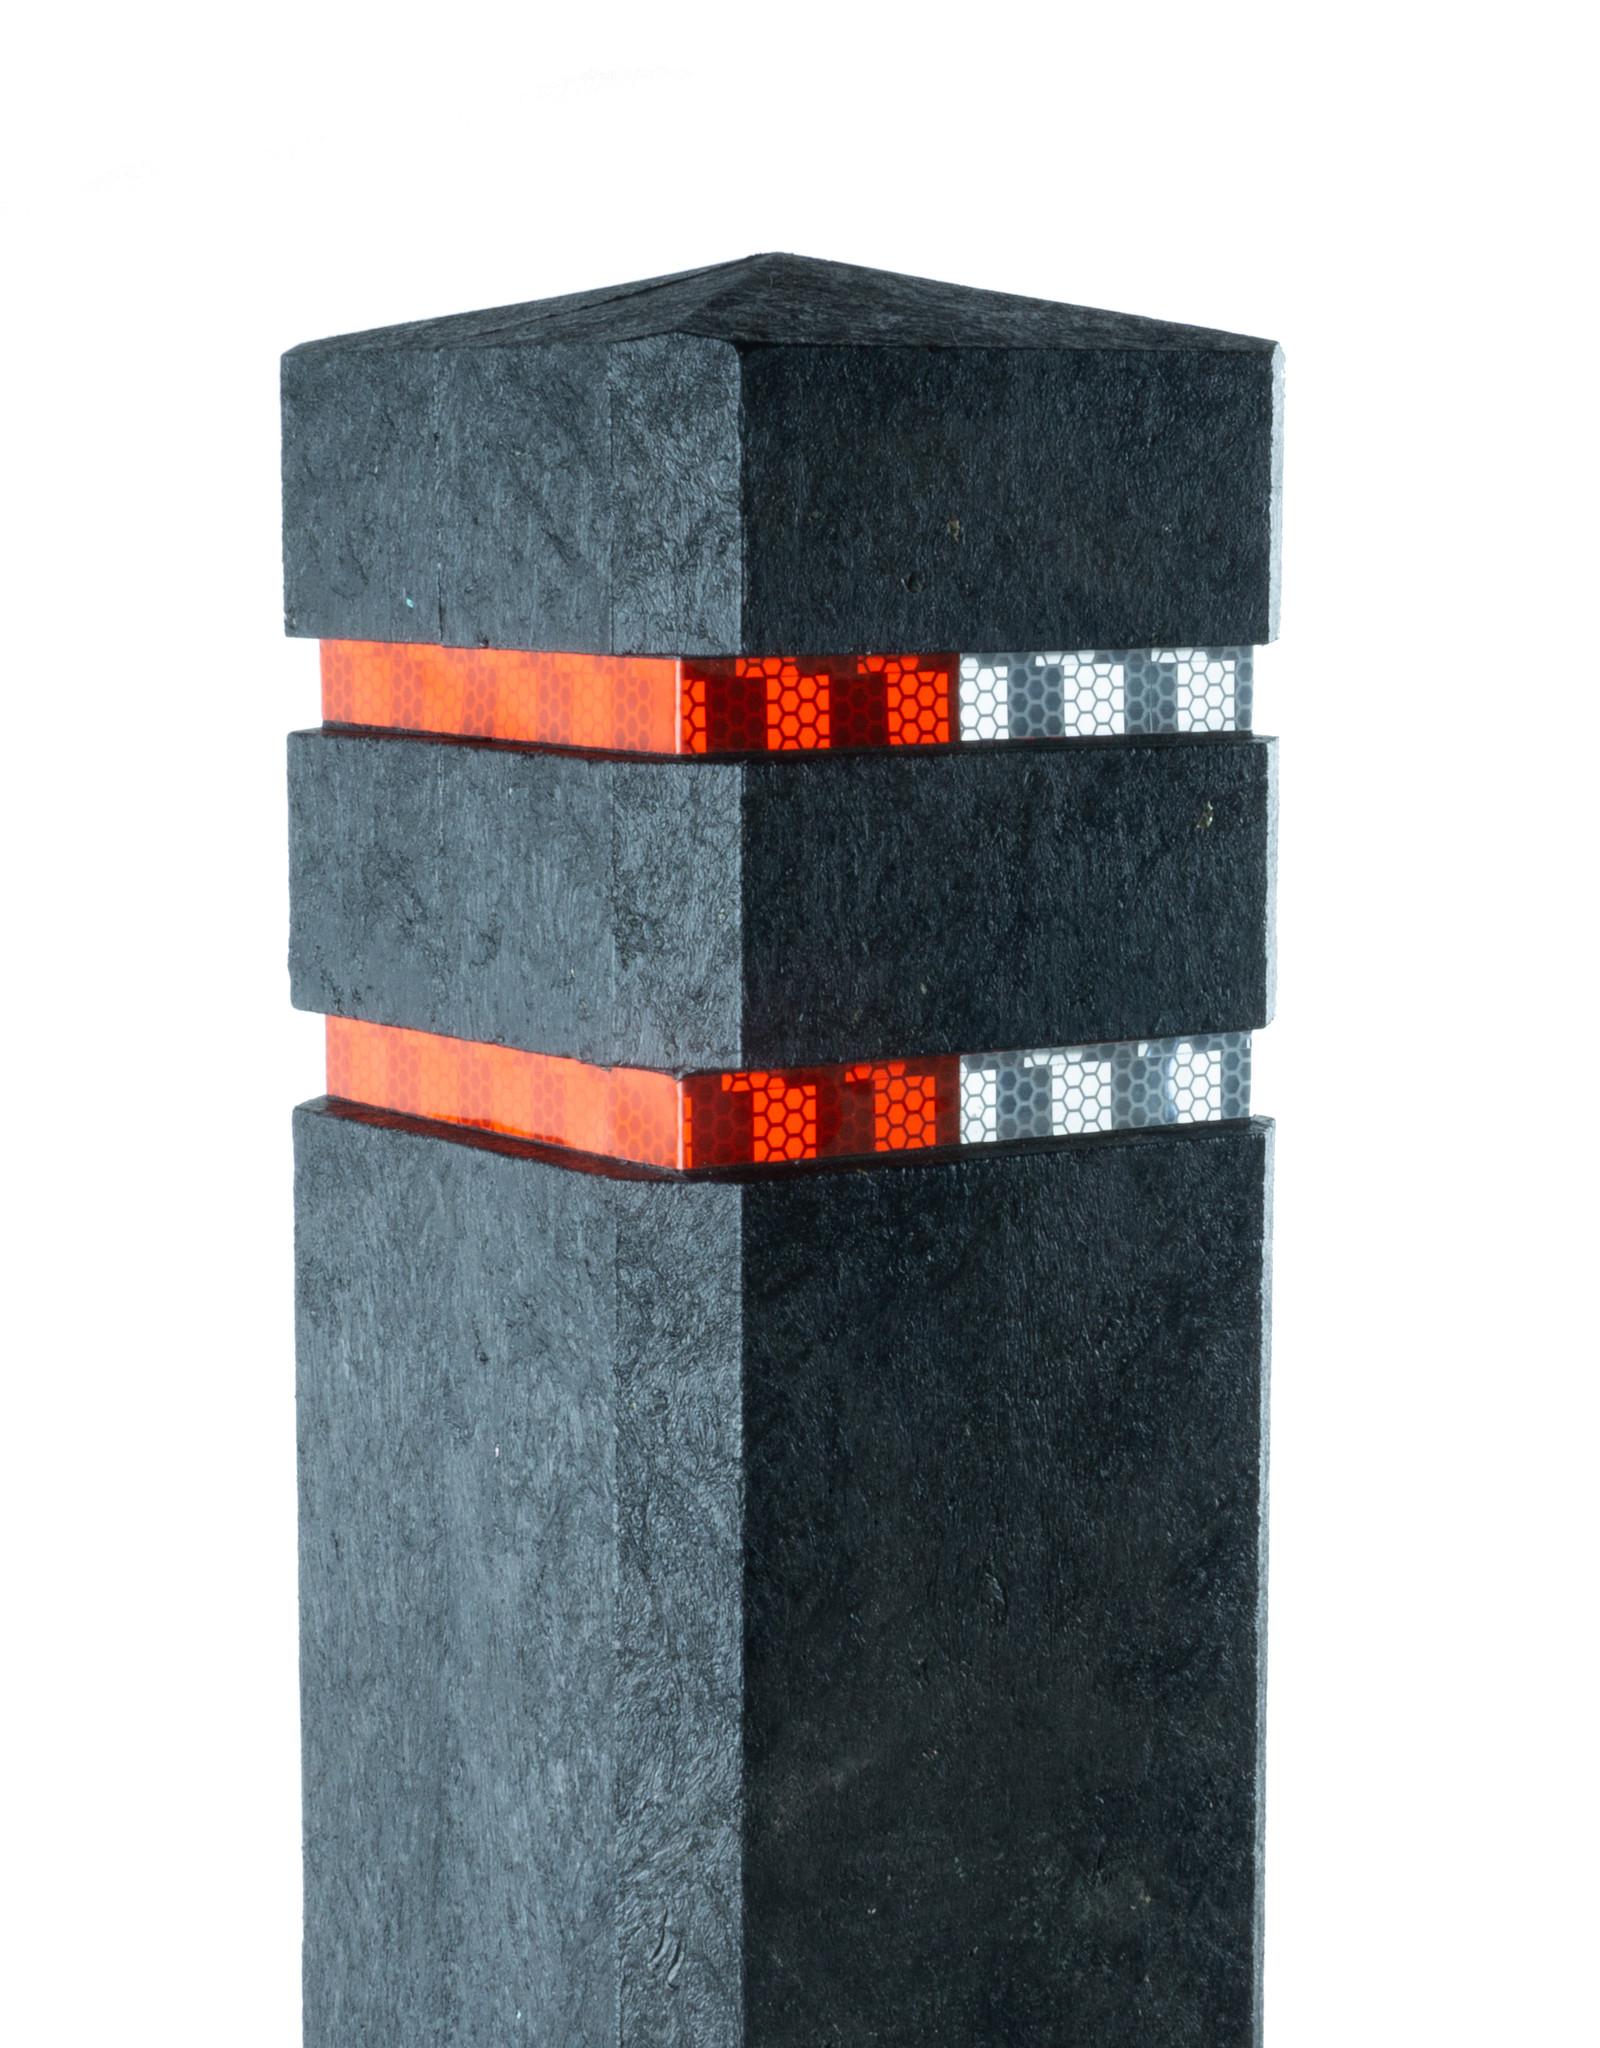 Ri-Traffic   Diamantkoppaal Kunststof / Anti Parkeerpaal / Trottoirpaal / Reflectorpaal